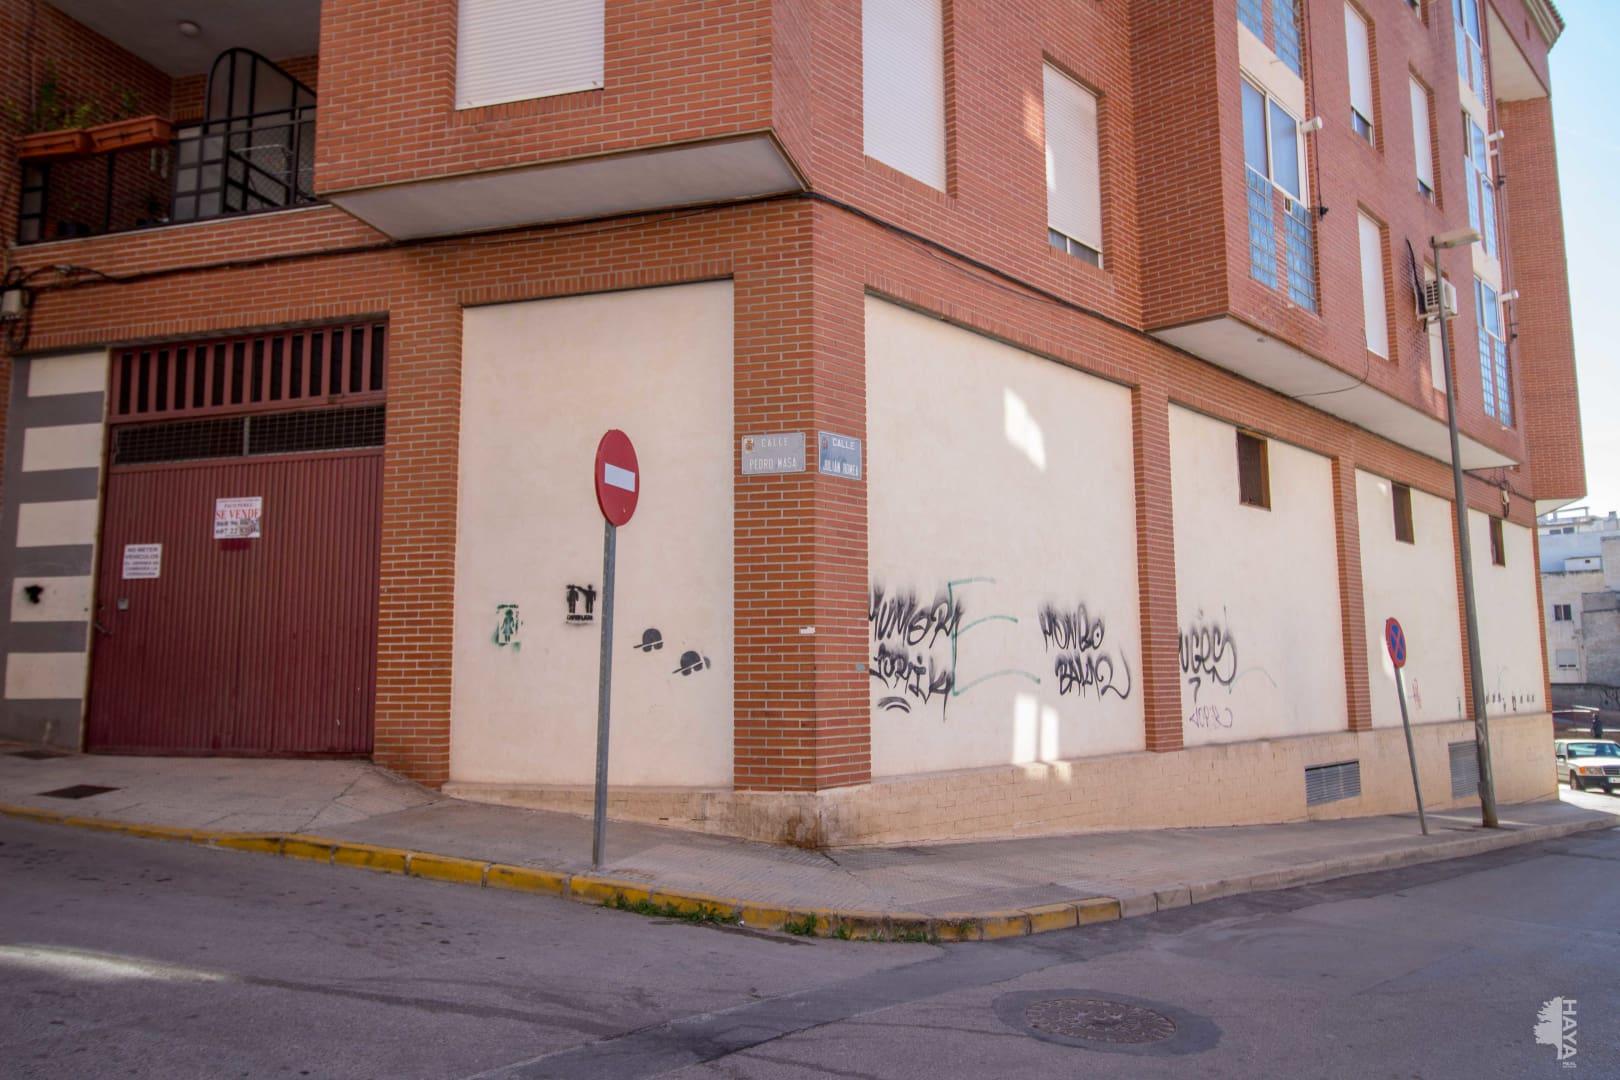 Local en venta en Fuensantilla, Cieza, Murcia, Calle Pedro Massa Perez, 557.403 €, 596 m2